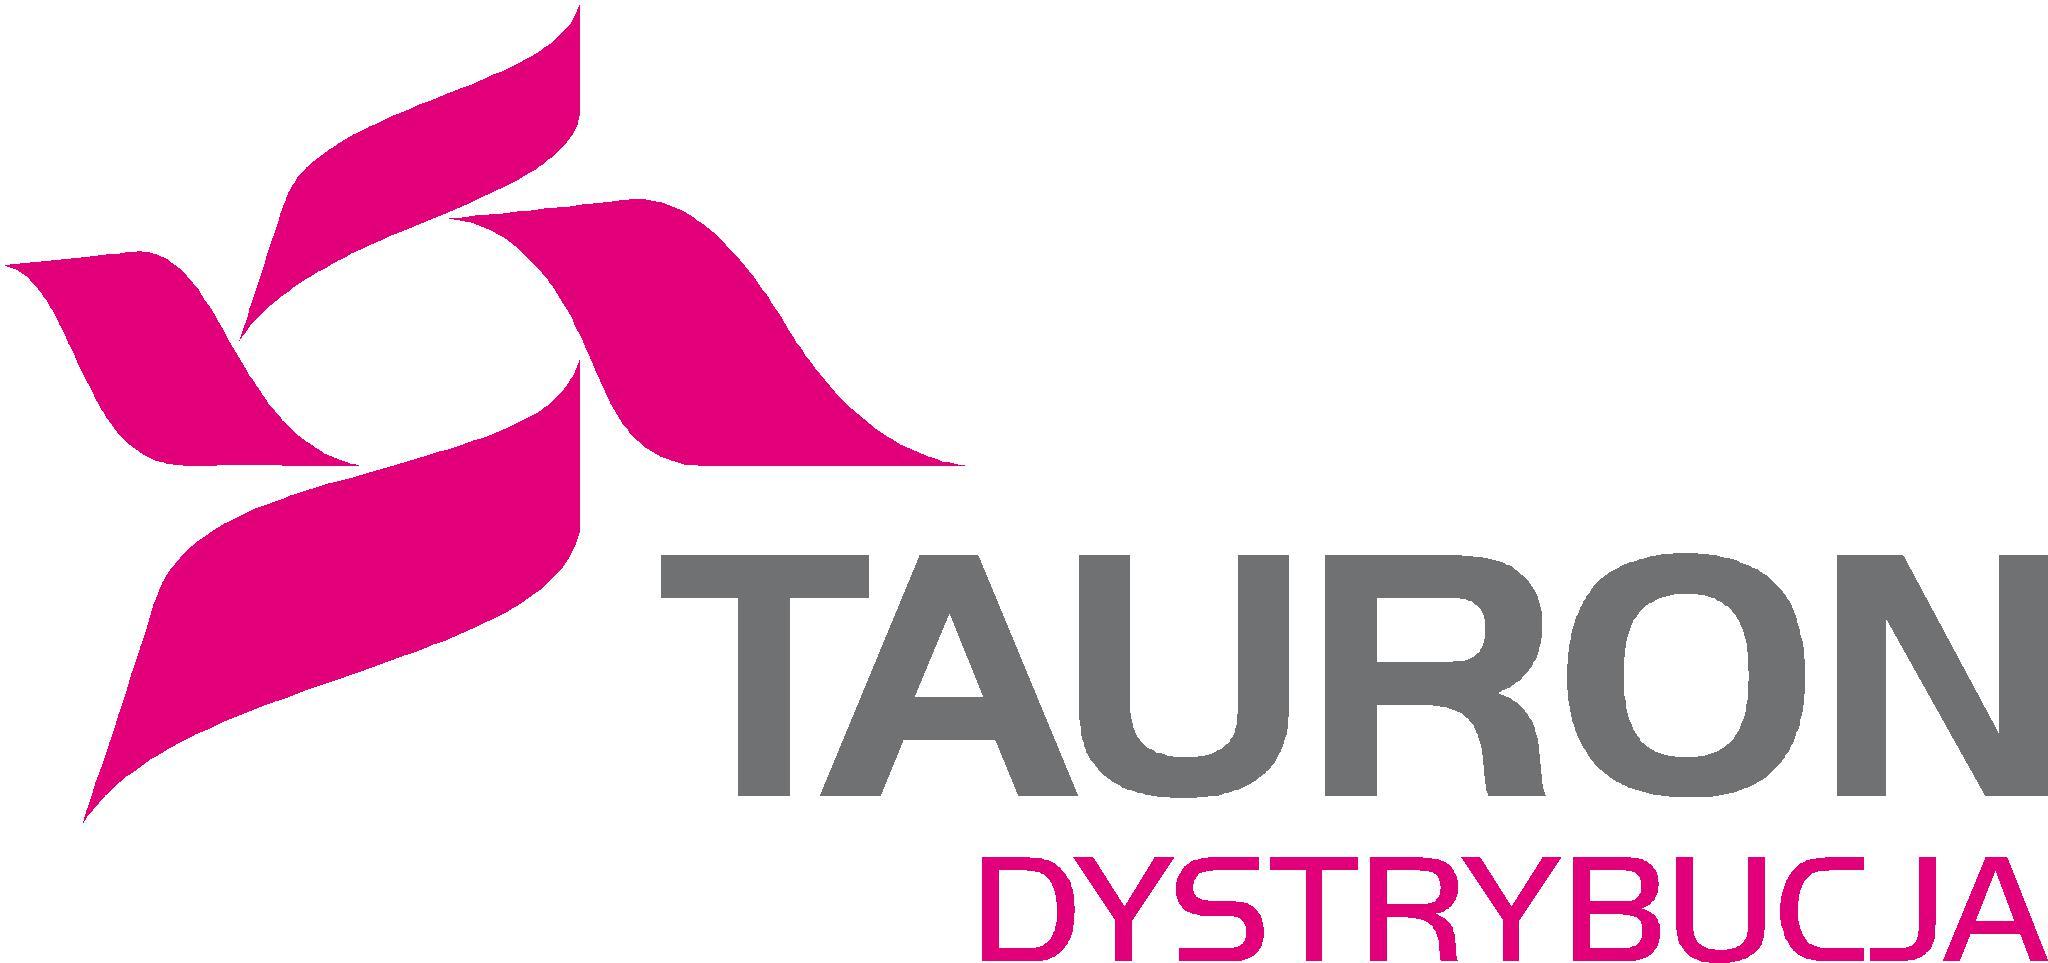 Tauron Dystrybucja S.A. logo